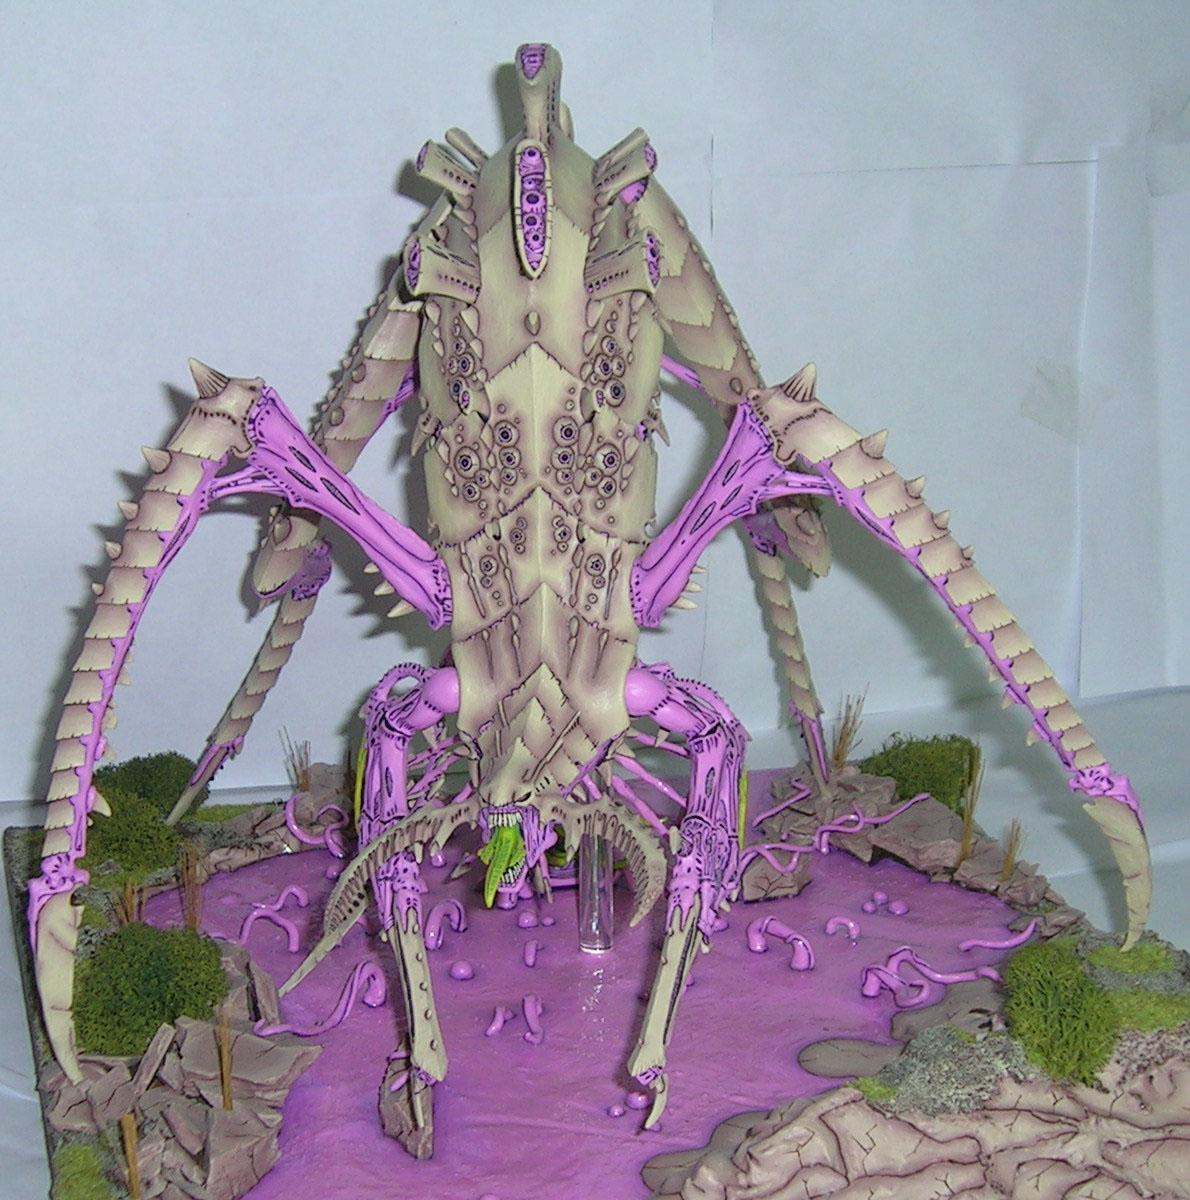 Bio-titan, Bone, Forge World, Monster, Nard, Pink, Titan, Tyranids, Warhammer 40,000, Warhammer Fantasy